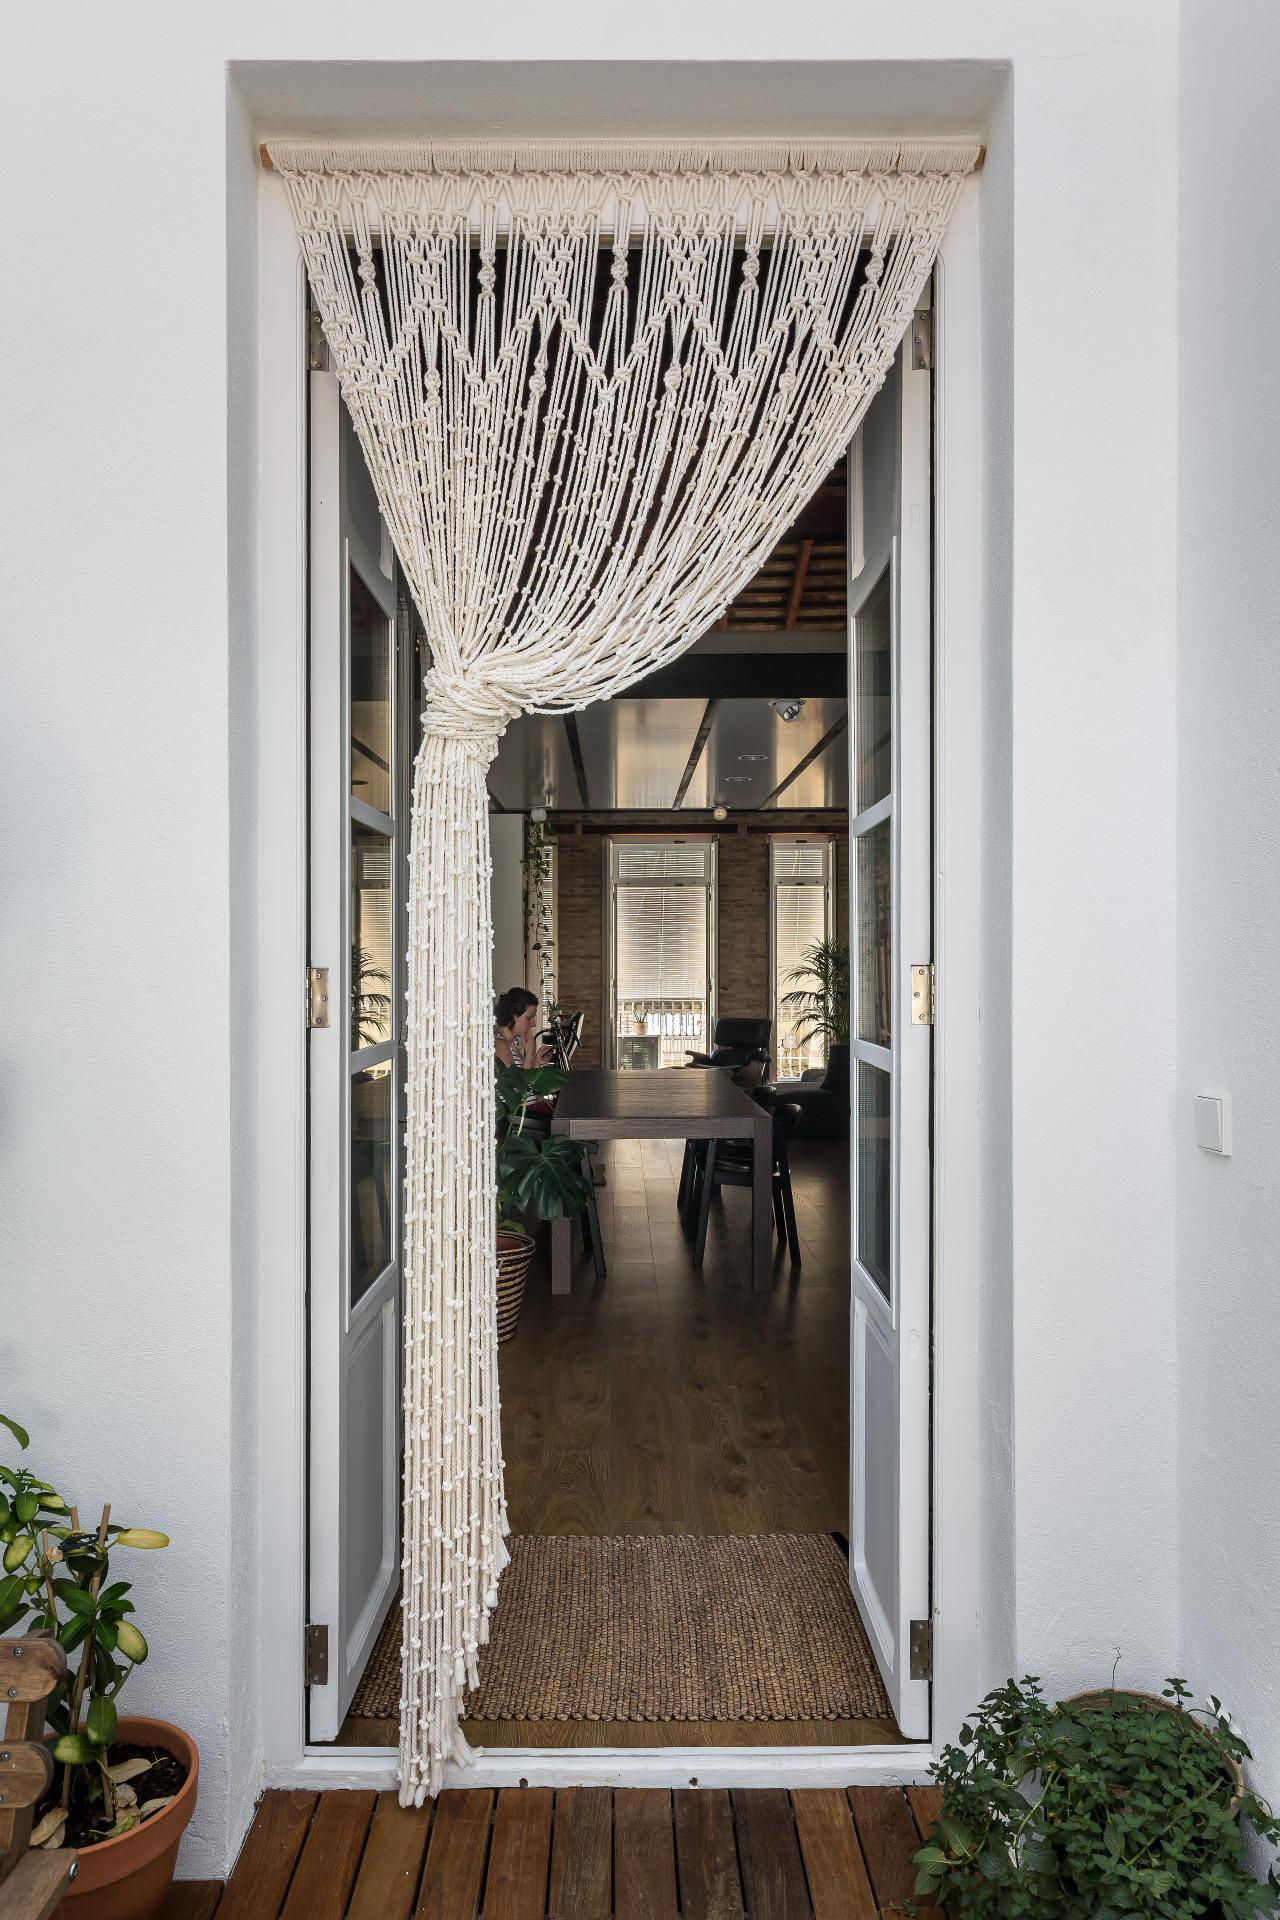 fotografia-arquitectura-valencia-german-cabo-ambau-cabanyal (14)